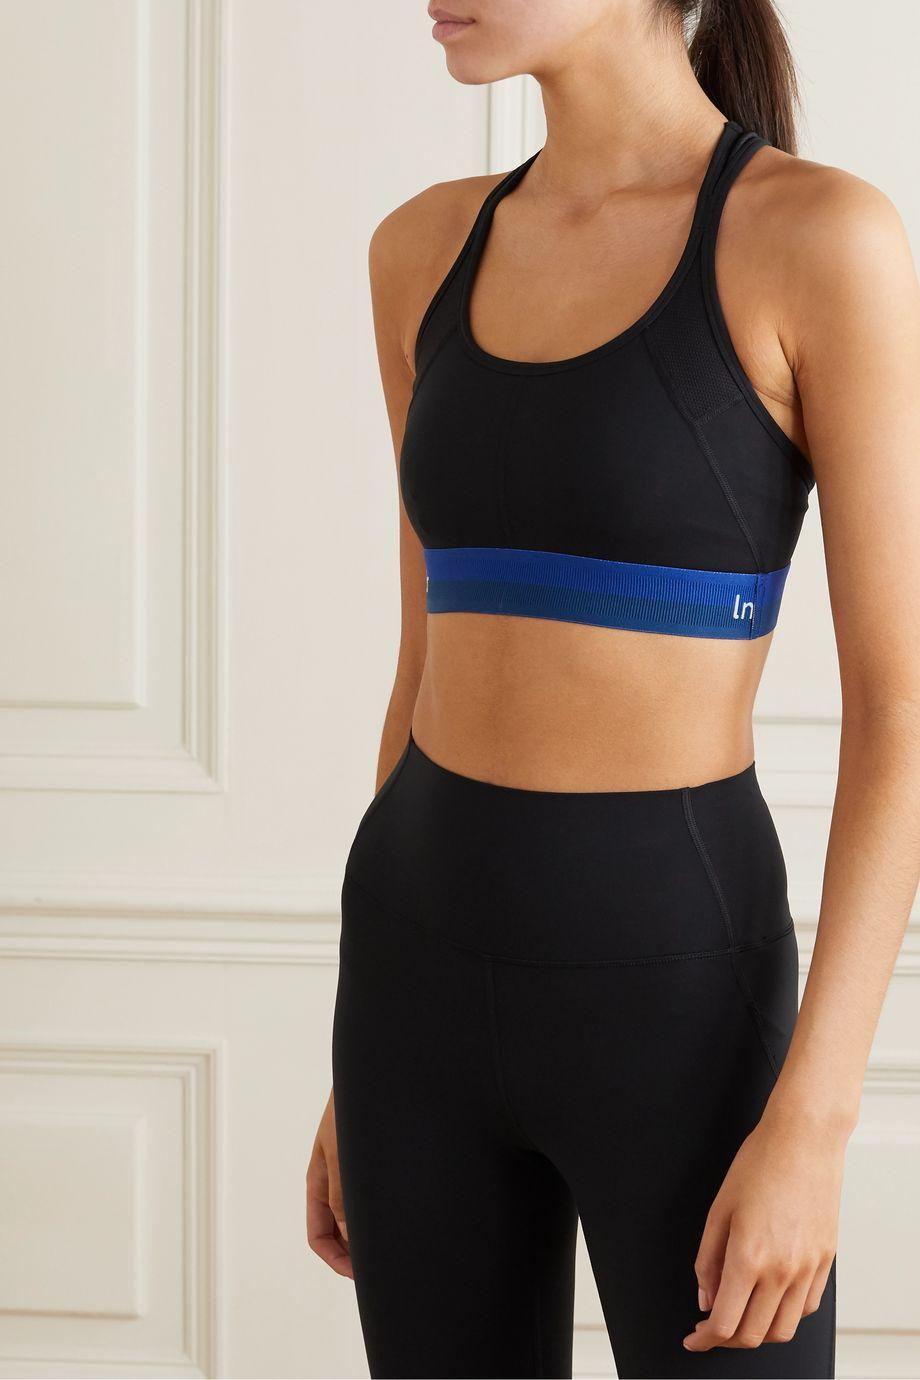 LNDR Workout mesh-paneled stretch sports bra